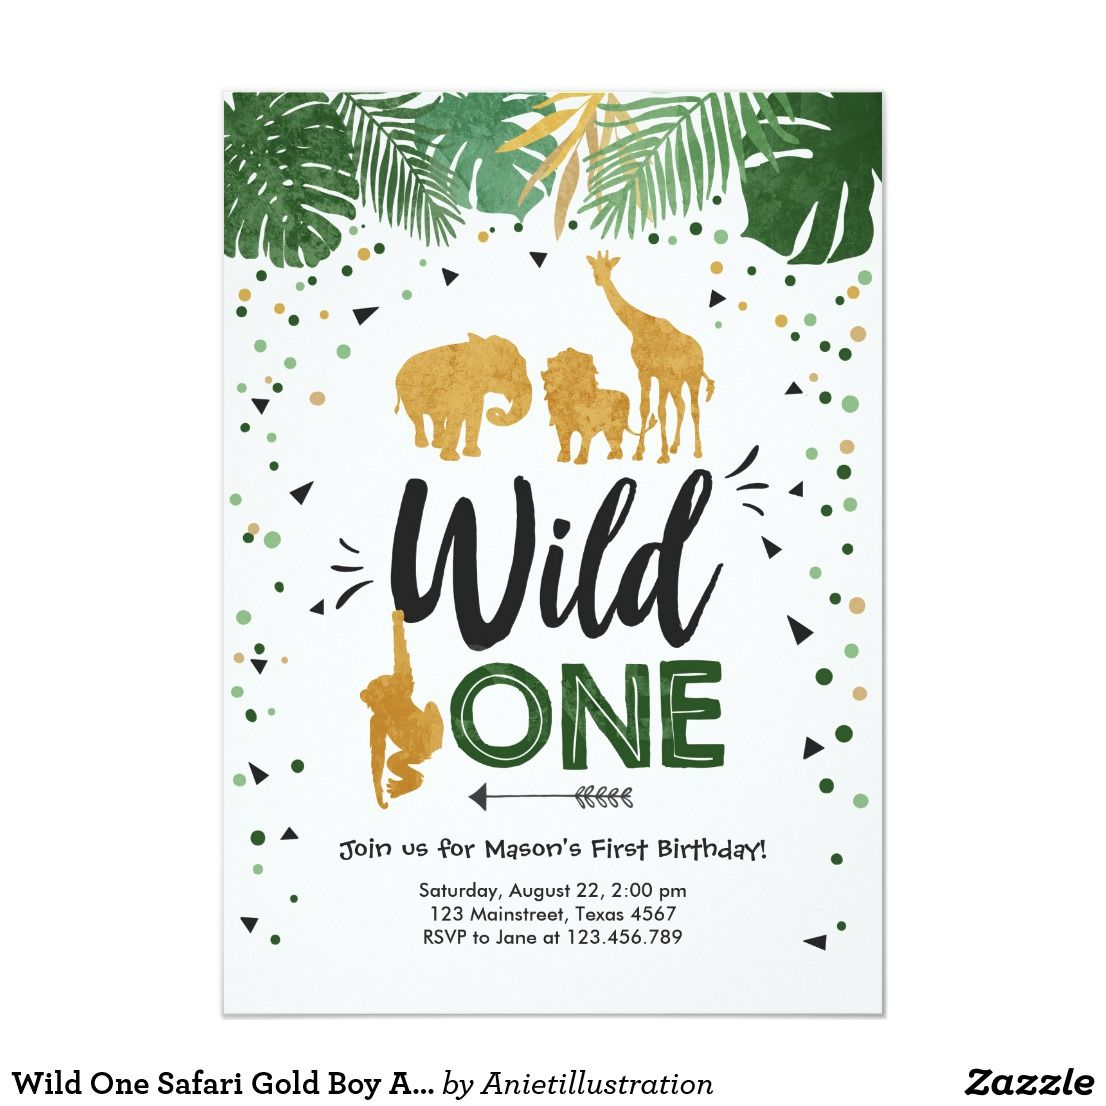 Wild One Safari Gold Boy Animals Birthday Party Invitation | Zazzle.com #safaribirthdayparty